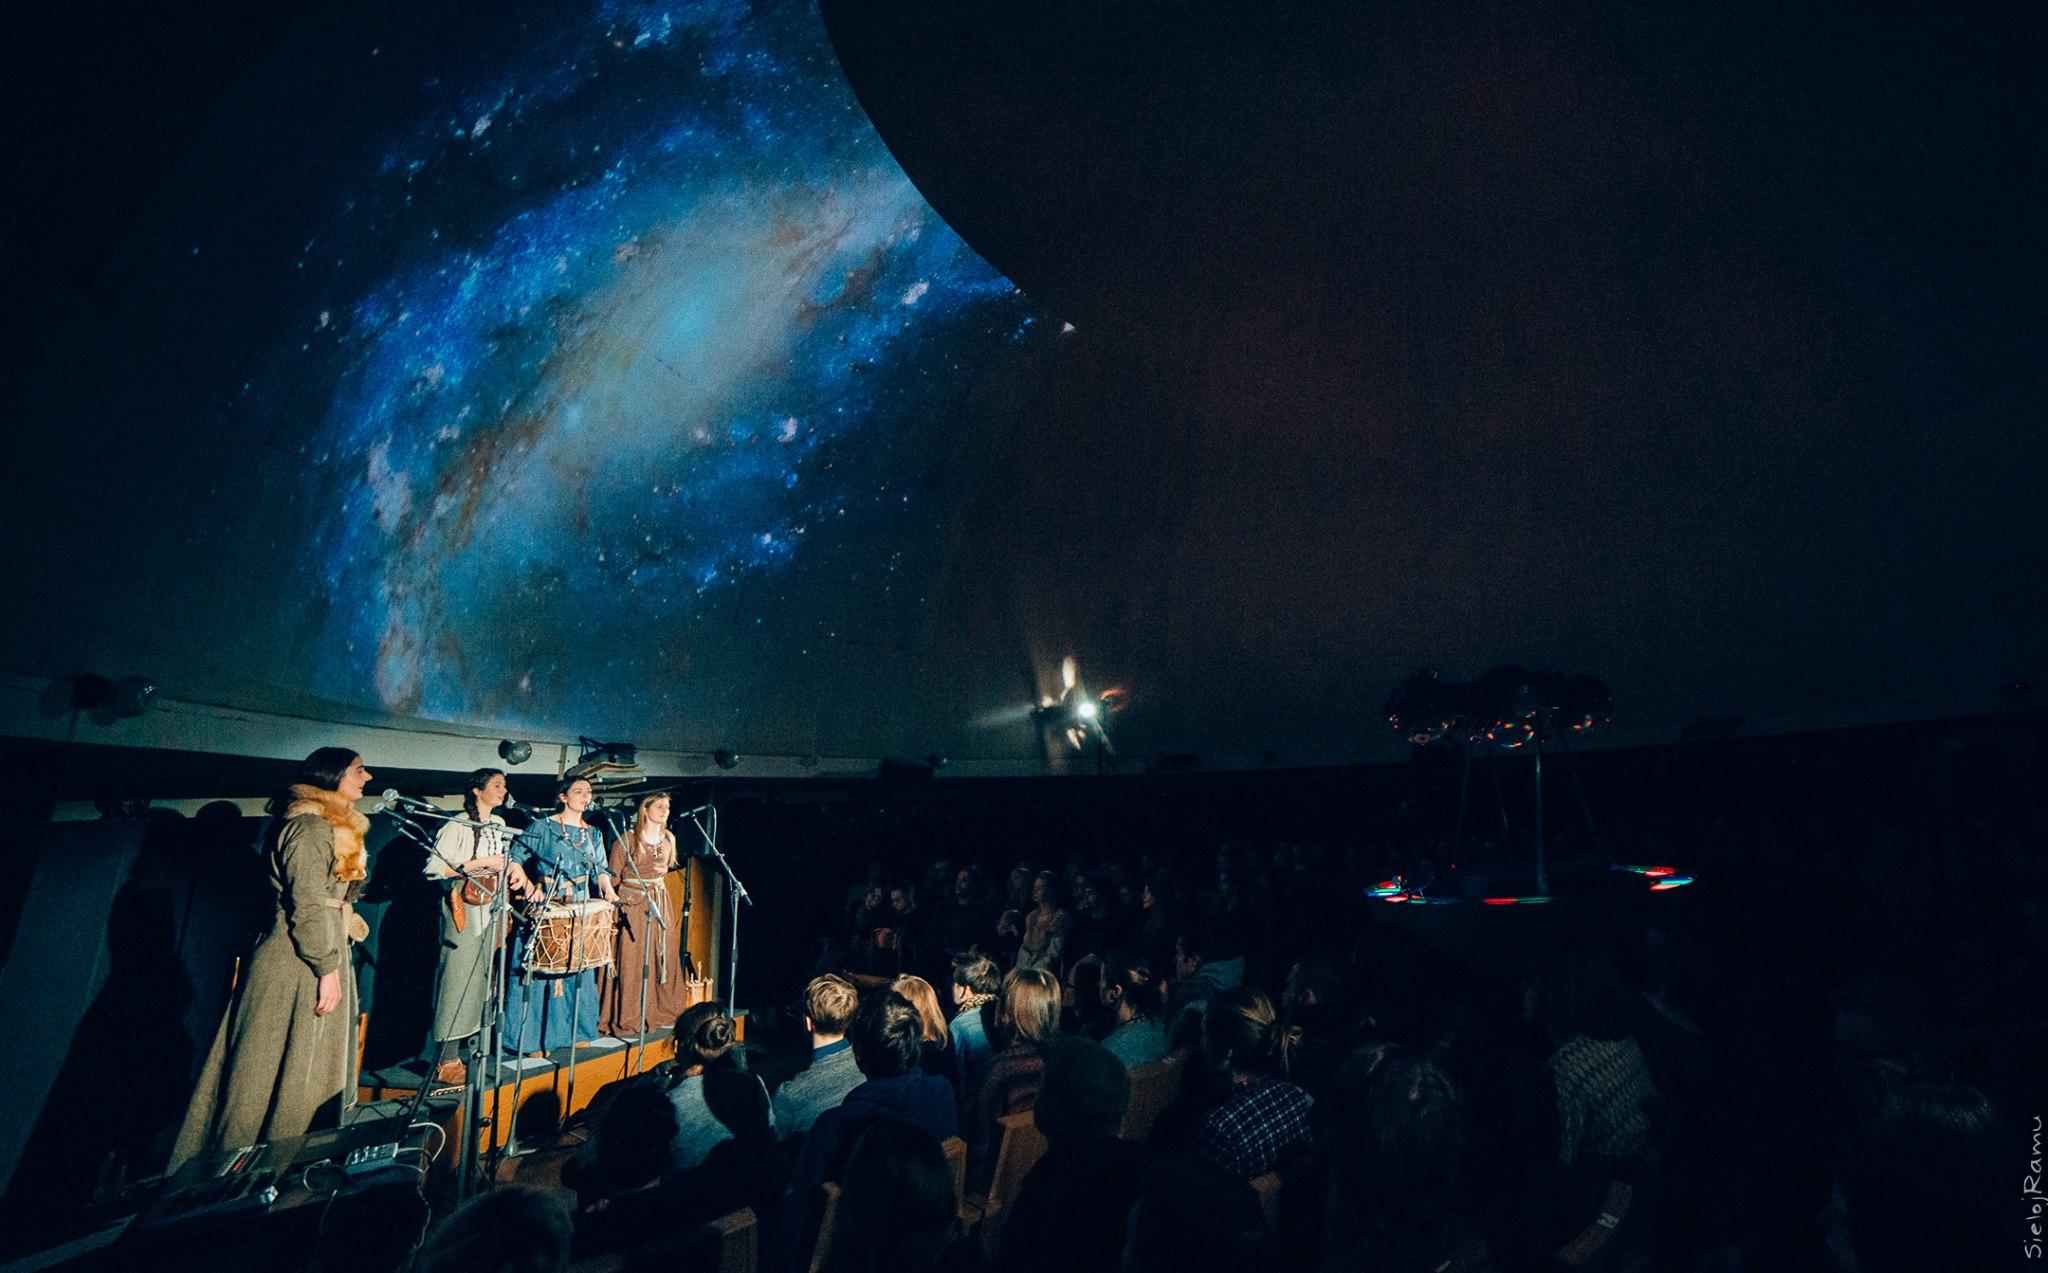 Obelija 2017 Planetariume | M. Puidos nuotr.